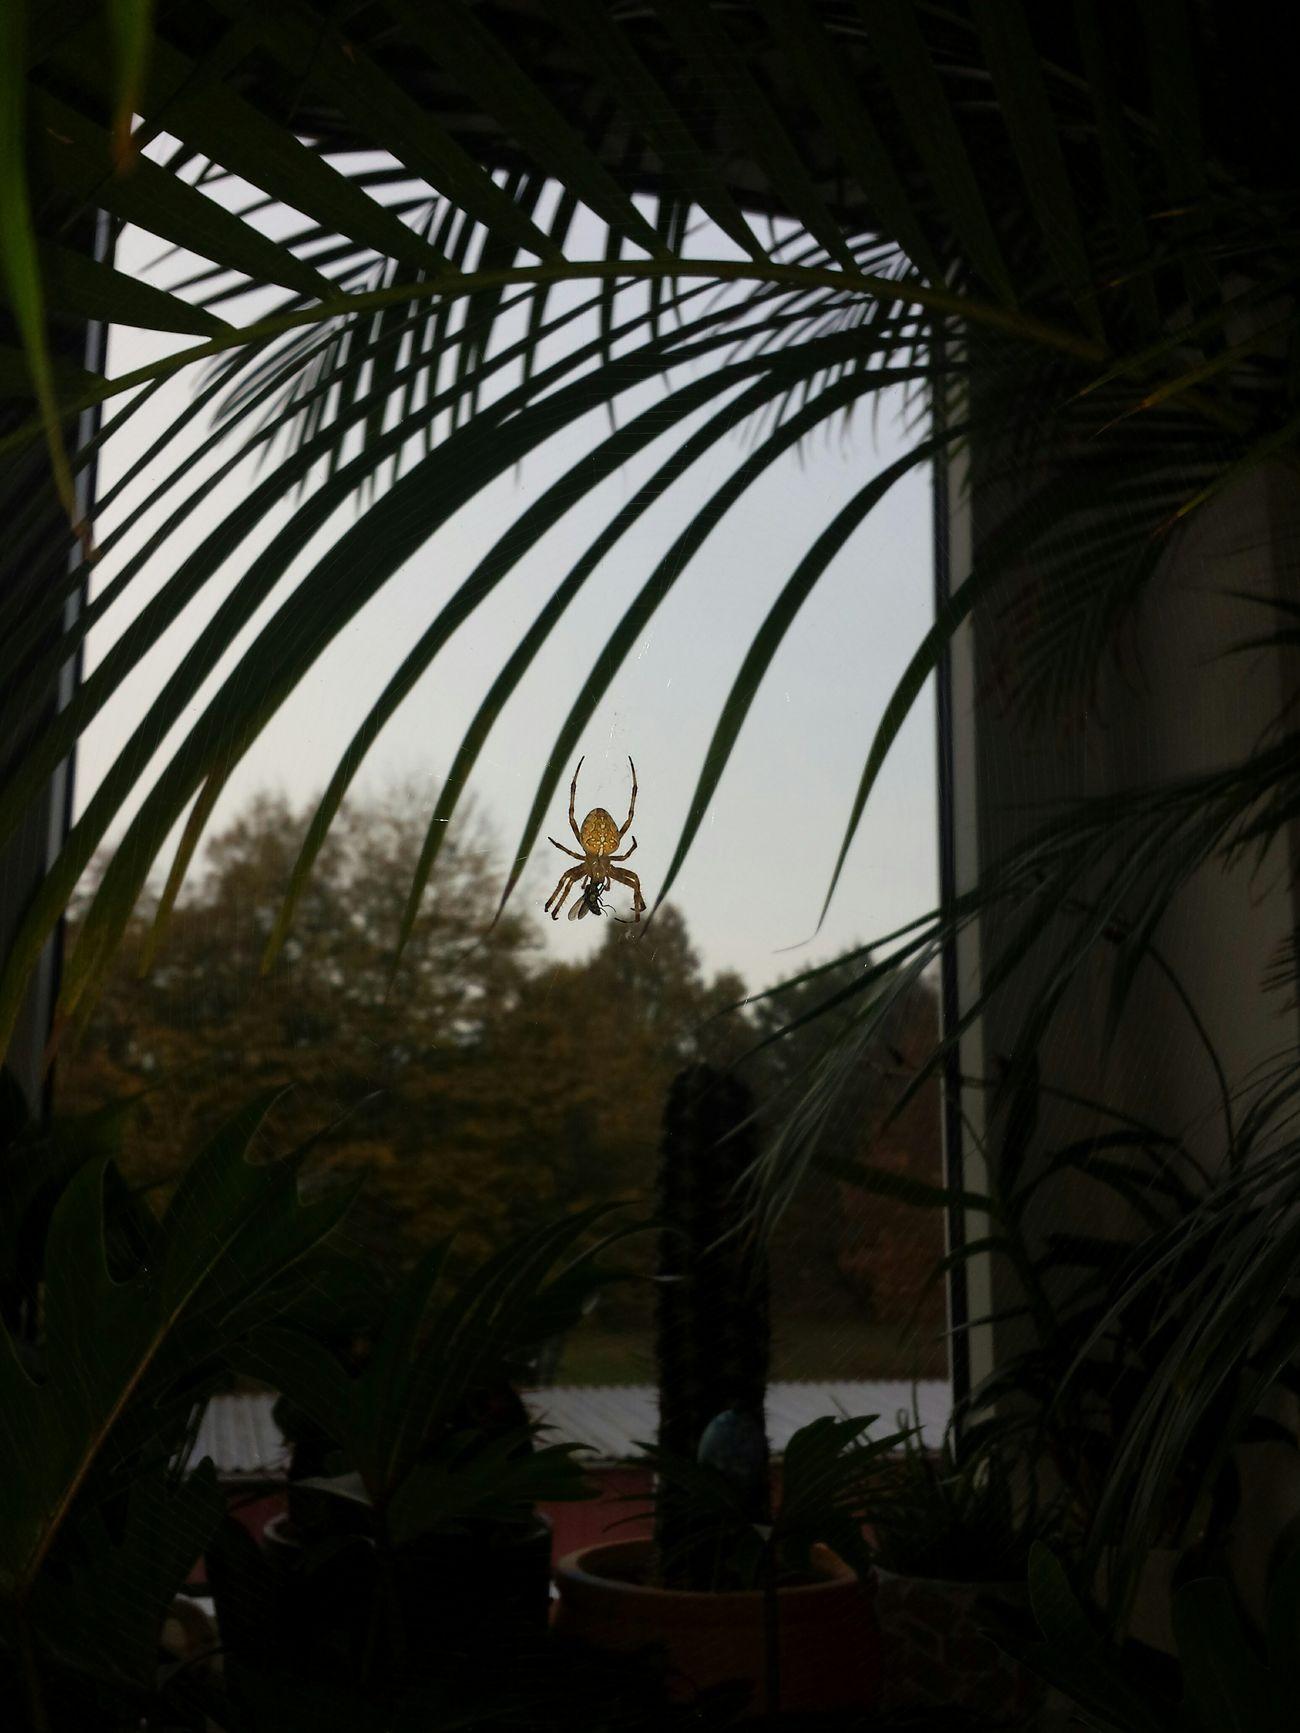 Kreuzspinne Gartenkreuzspinne Kreuzspinne Tarantula